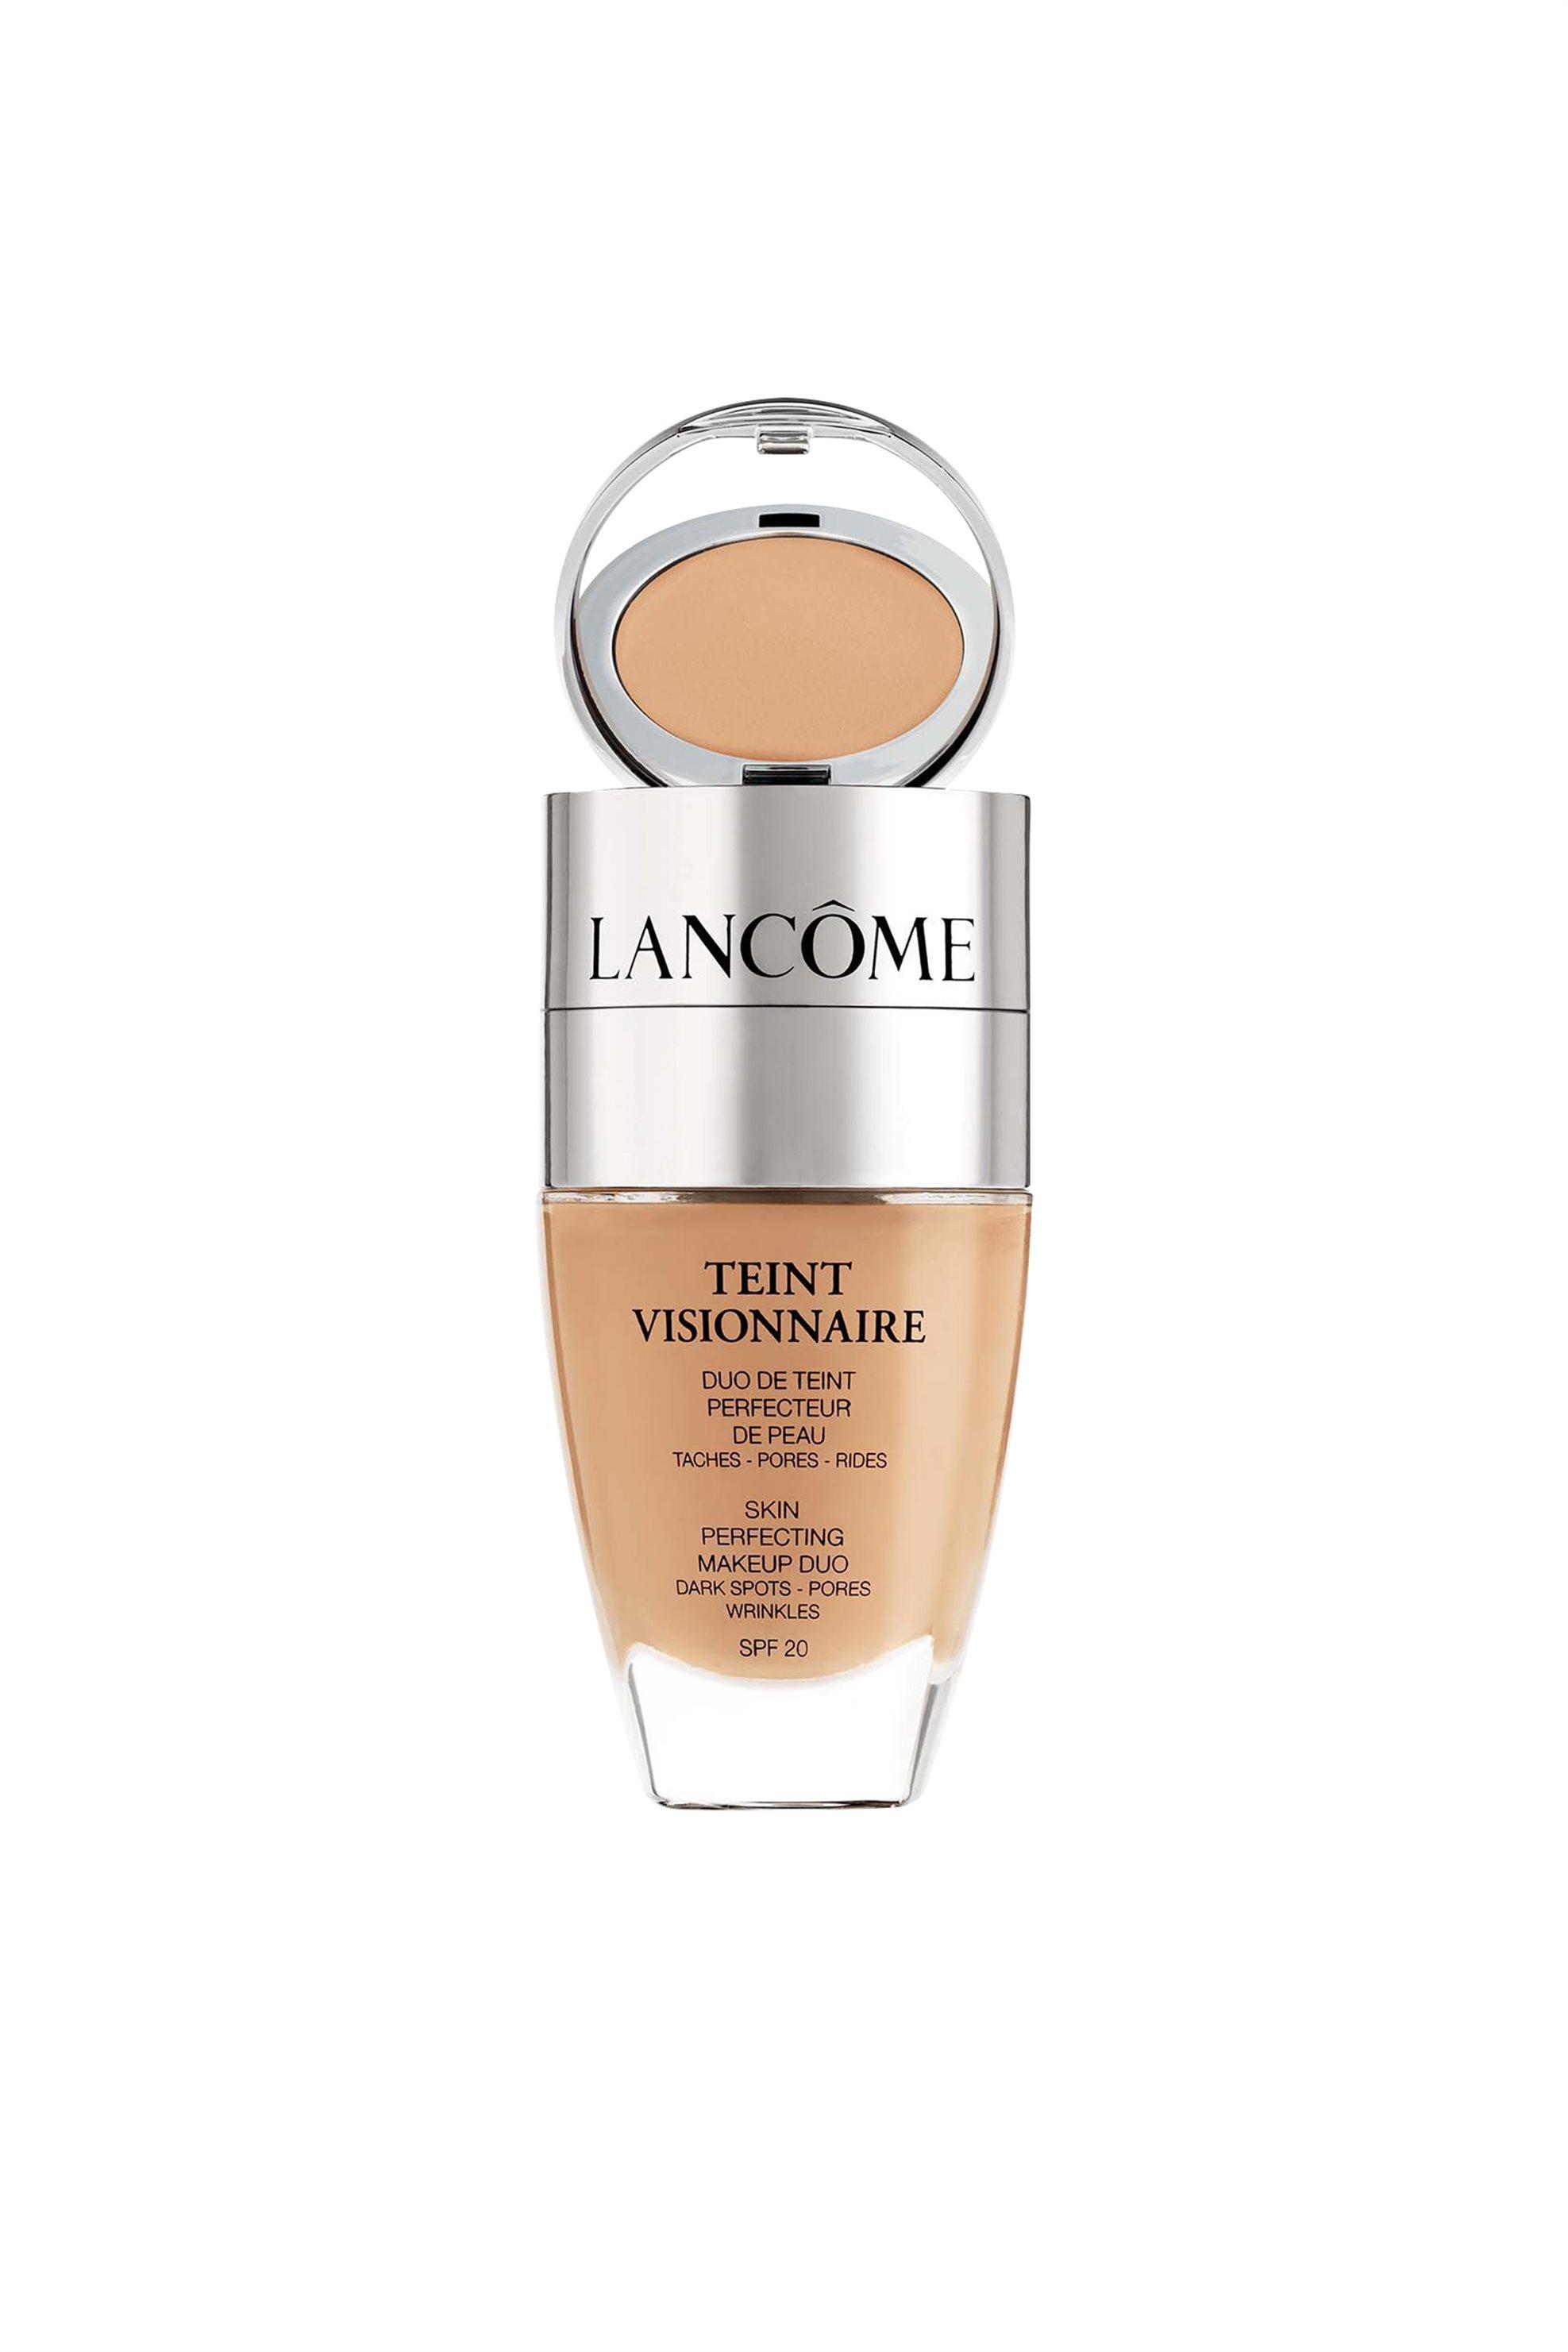 Lancôme Teint Visionnaire Skin Perfecting Makeup Duo 04 Beige Nature 30 ml - 360 ομορφια   καλλυντικα επιλεκτικησ   μακιγιάζ   πρόσωπο   make ups   foundations